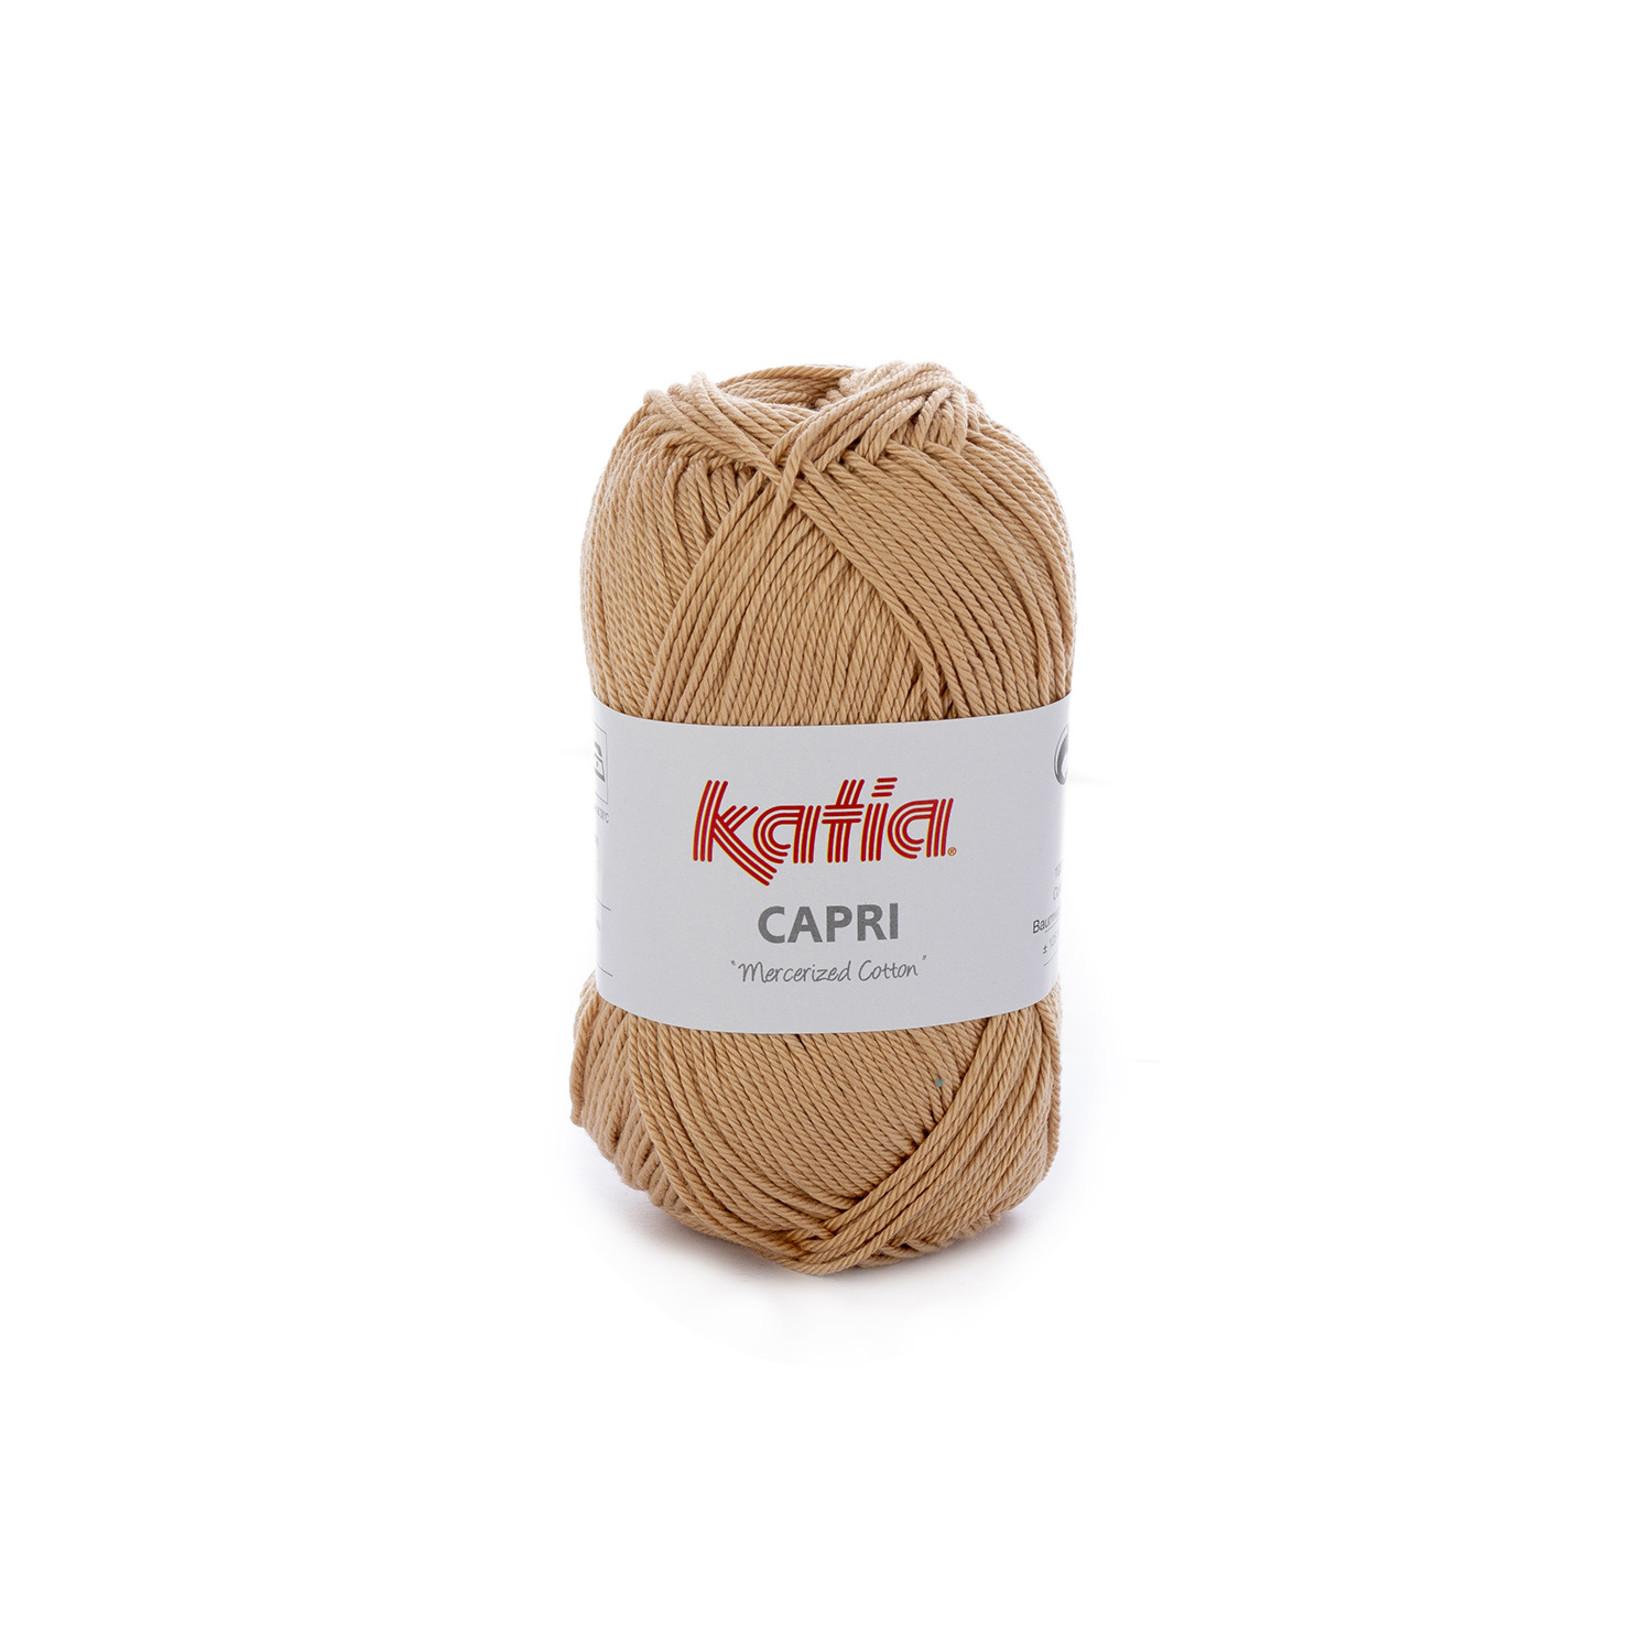 Katia Katia Capri - kleur 167 Zalmoranje - 50 gr. = 125 m. - 100% katoen